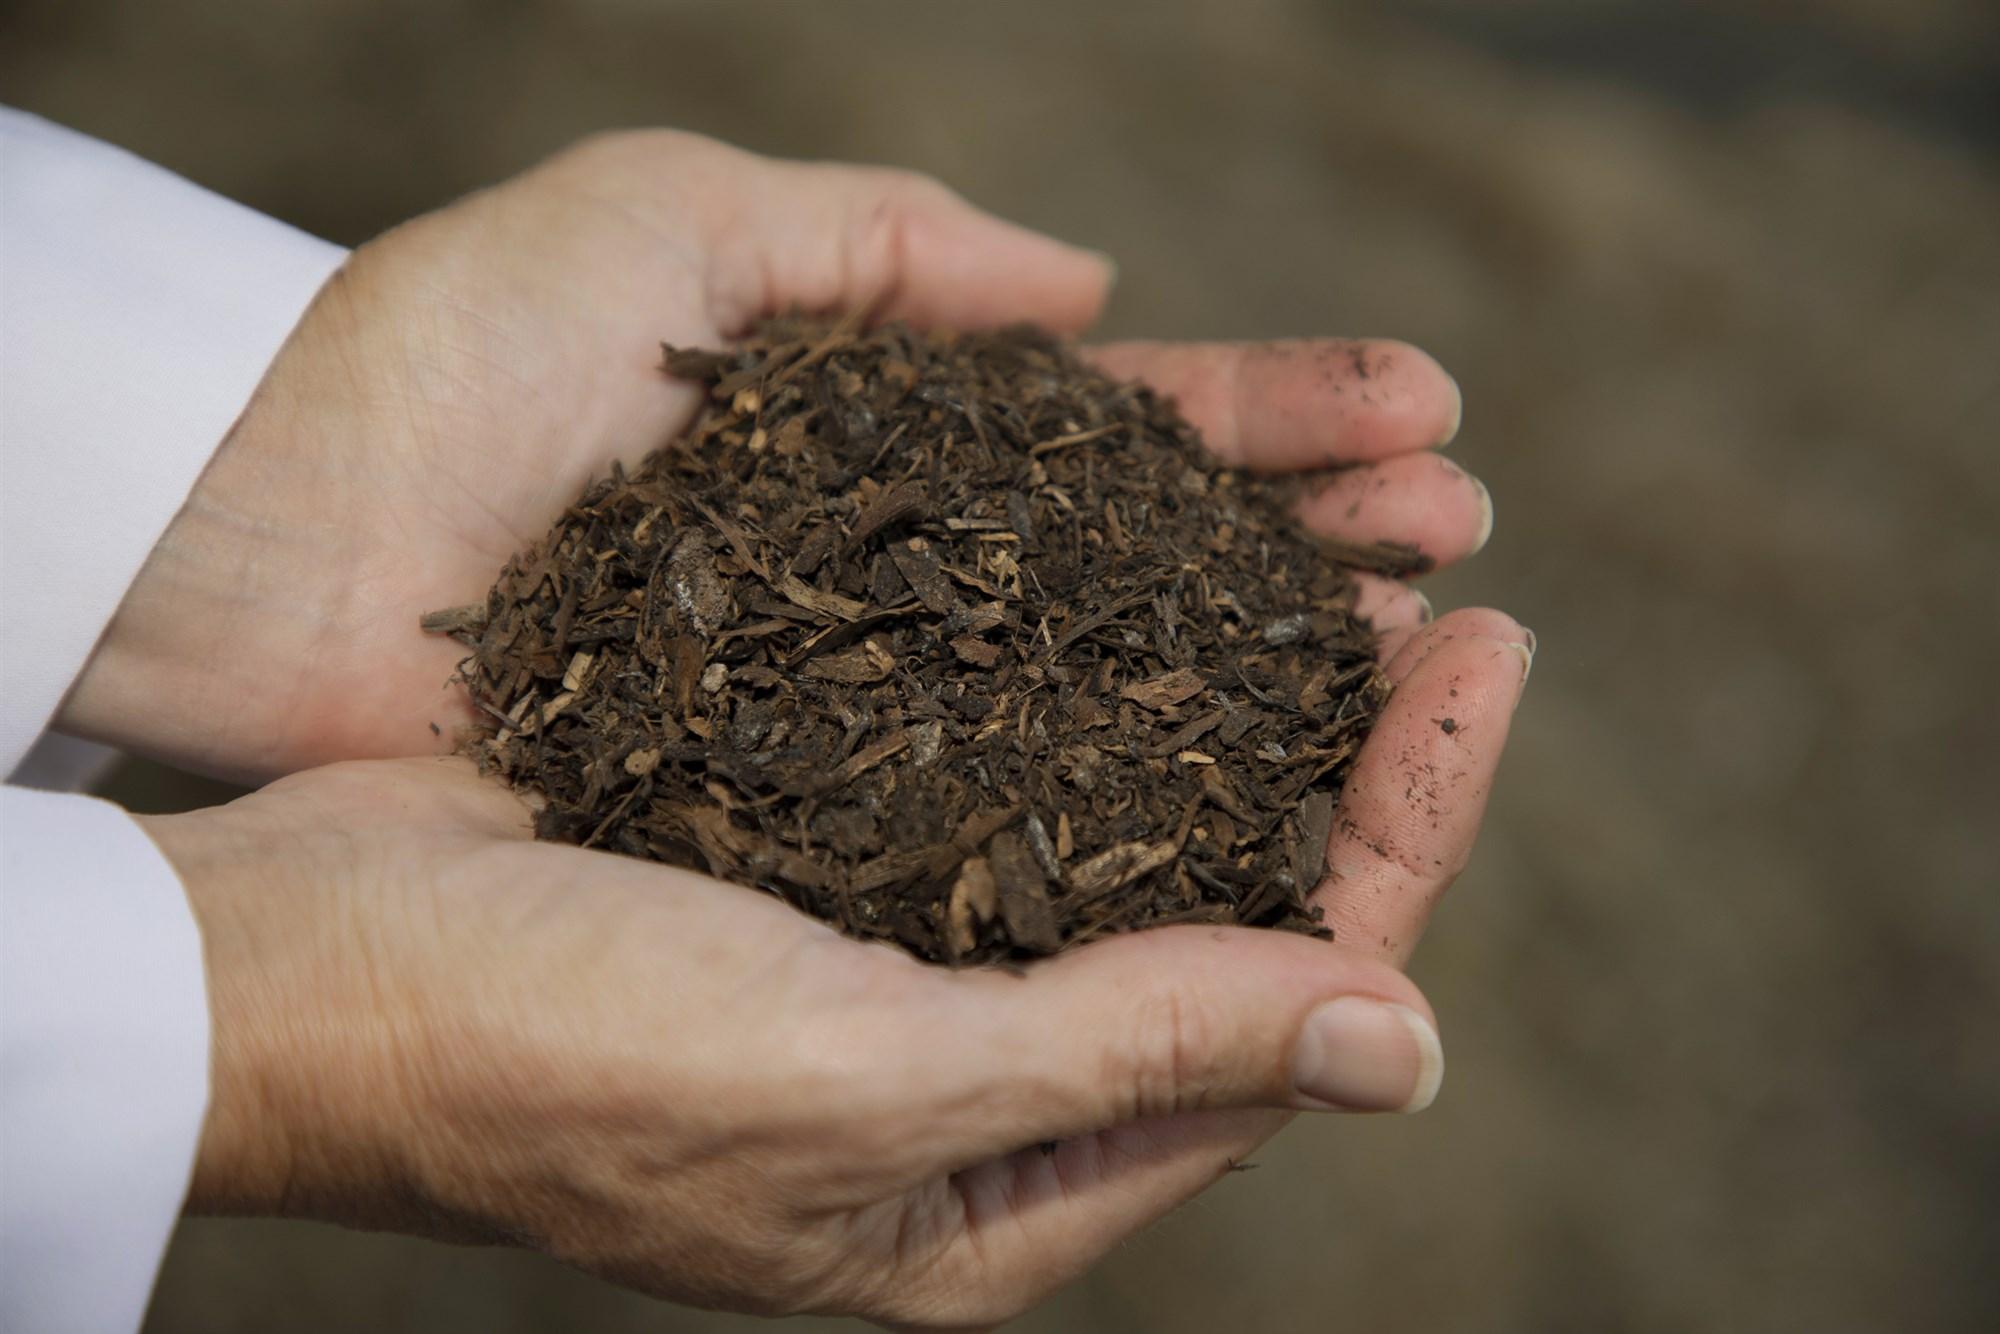 181221-recompose-compost-mn-1240_28d9822348696ec9061eb548d47496df.fit-2000w_1546118059895.jpg